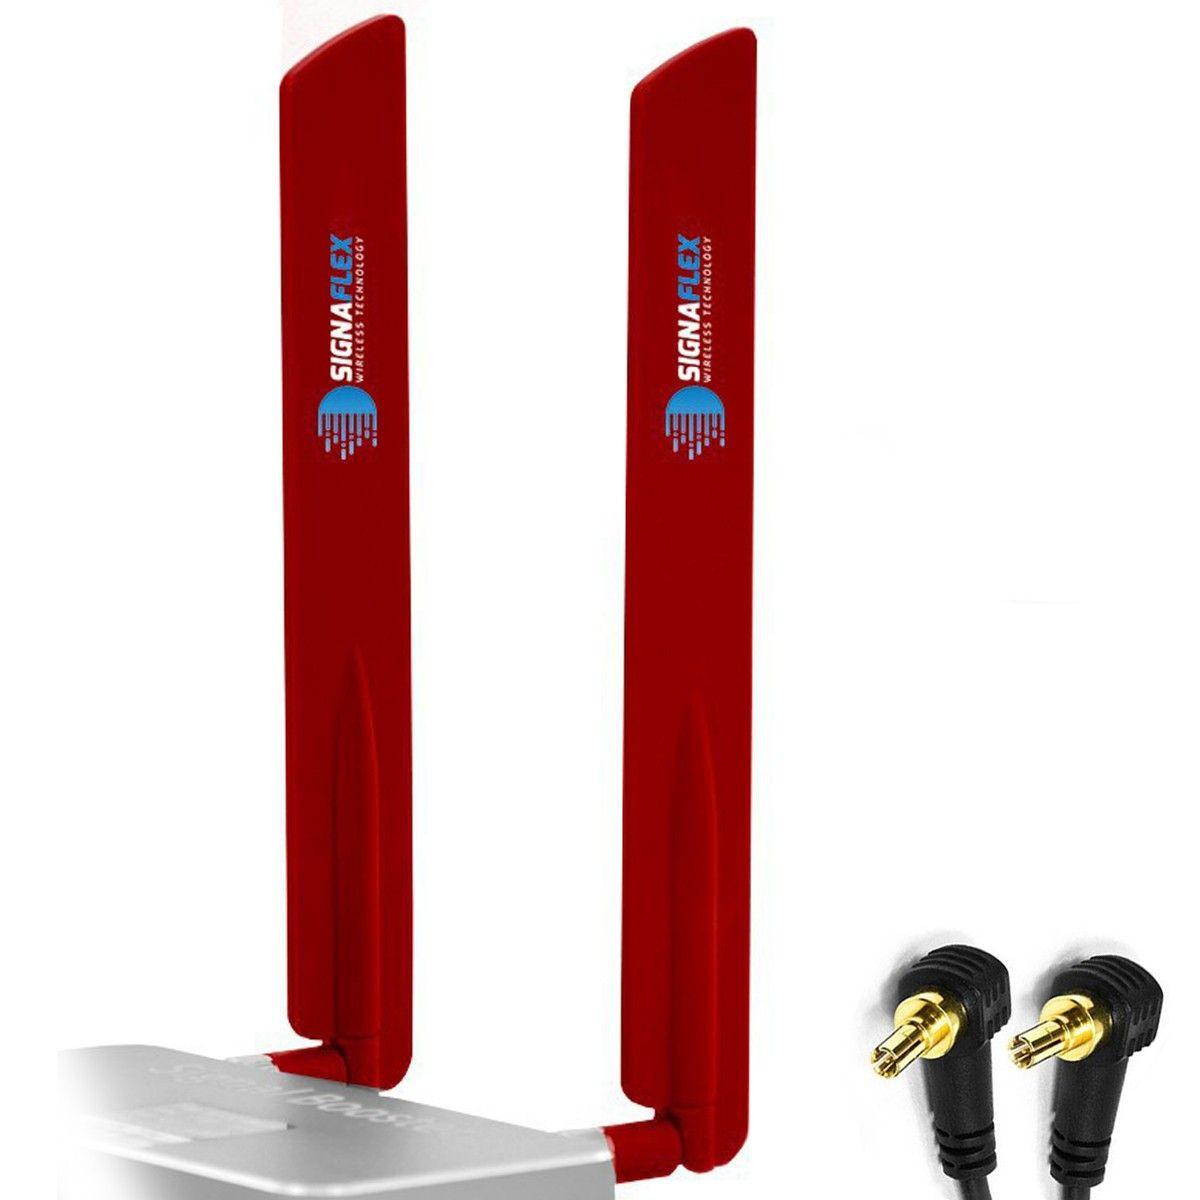 Antena bat 4G LTE RED 15dbi + CRC9 x 2szt